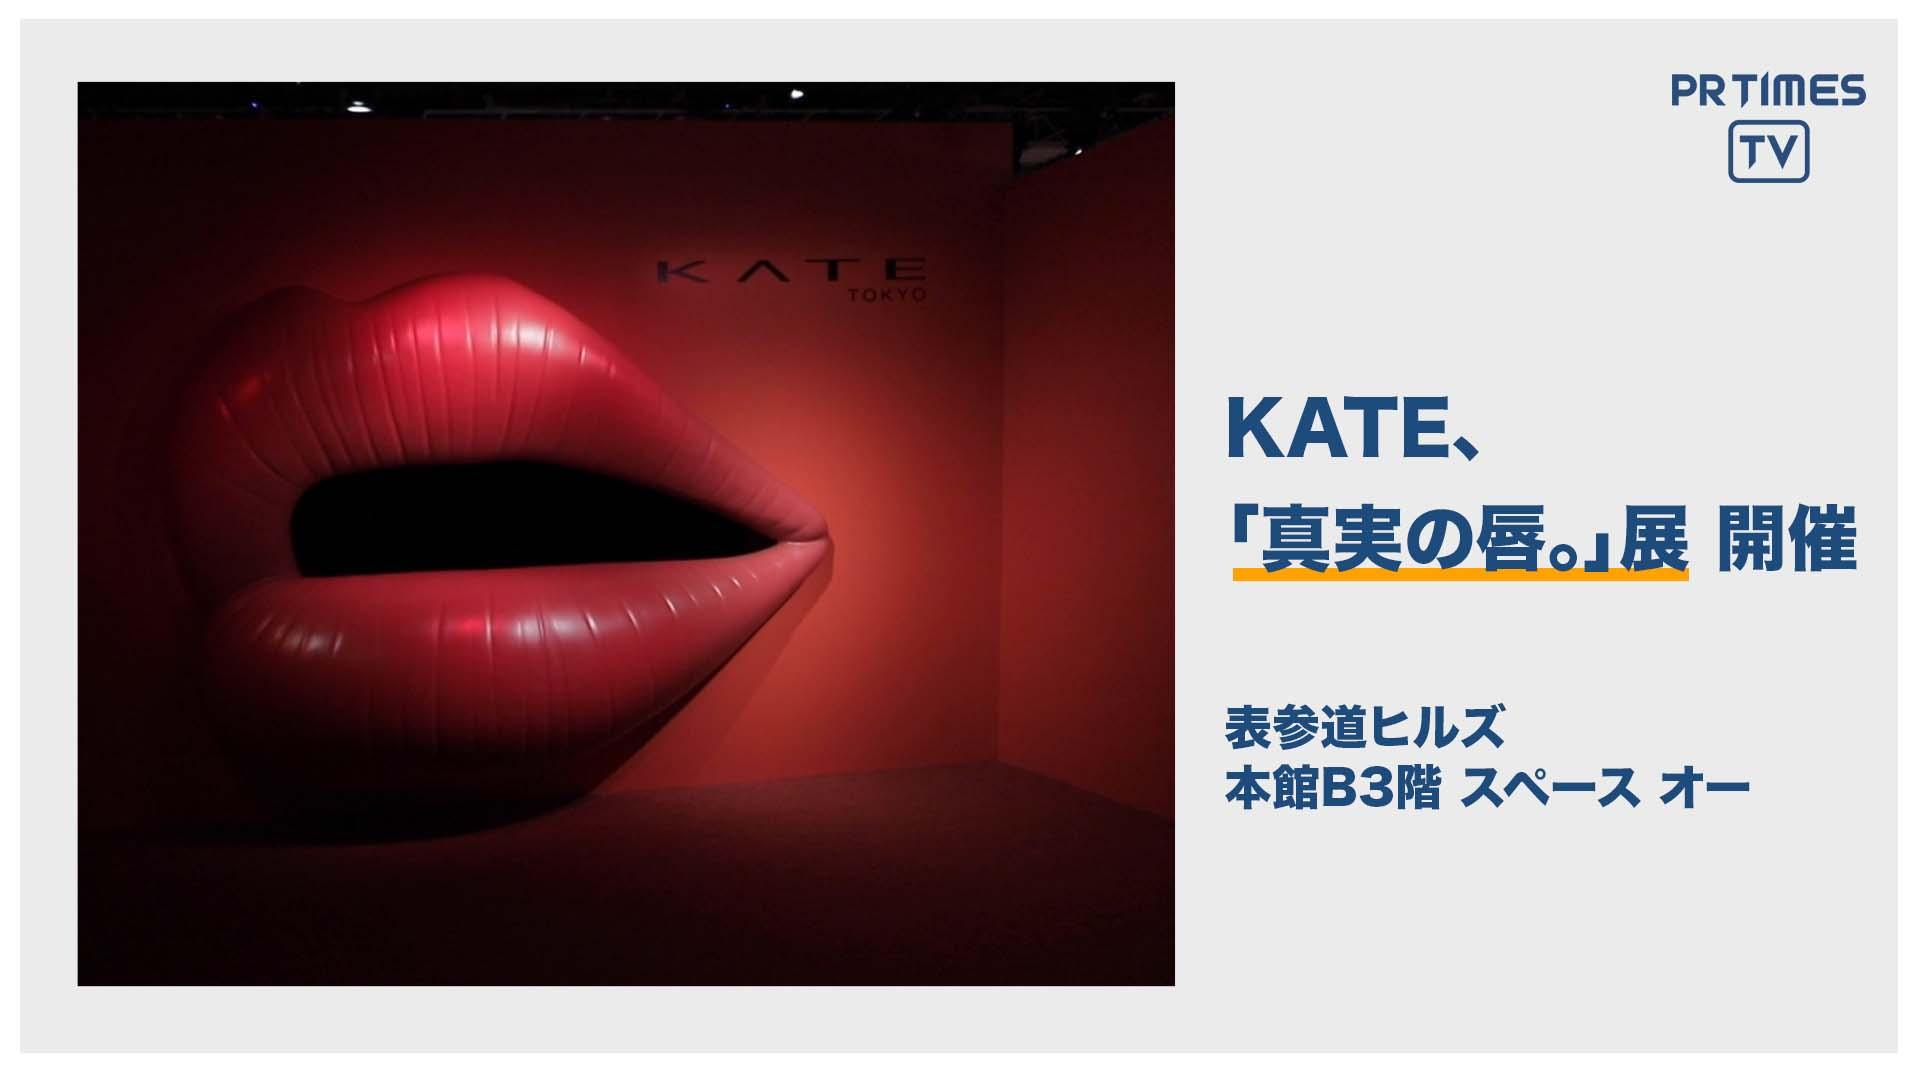 KATEの新ルージュ体験イベント「真実の唇。」展 開催